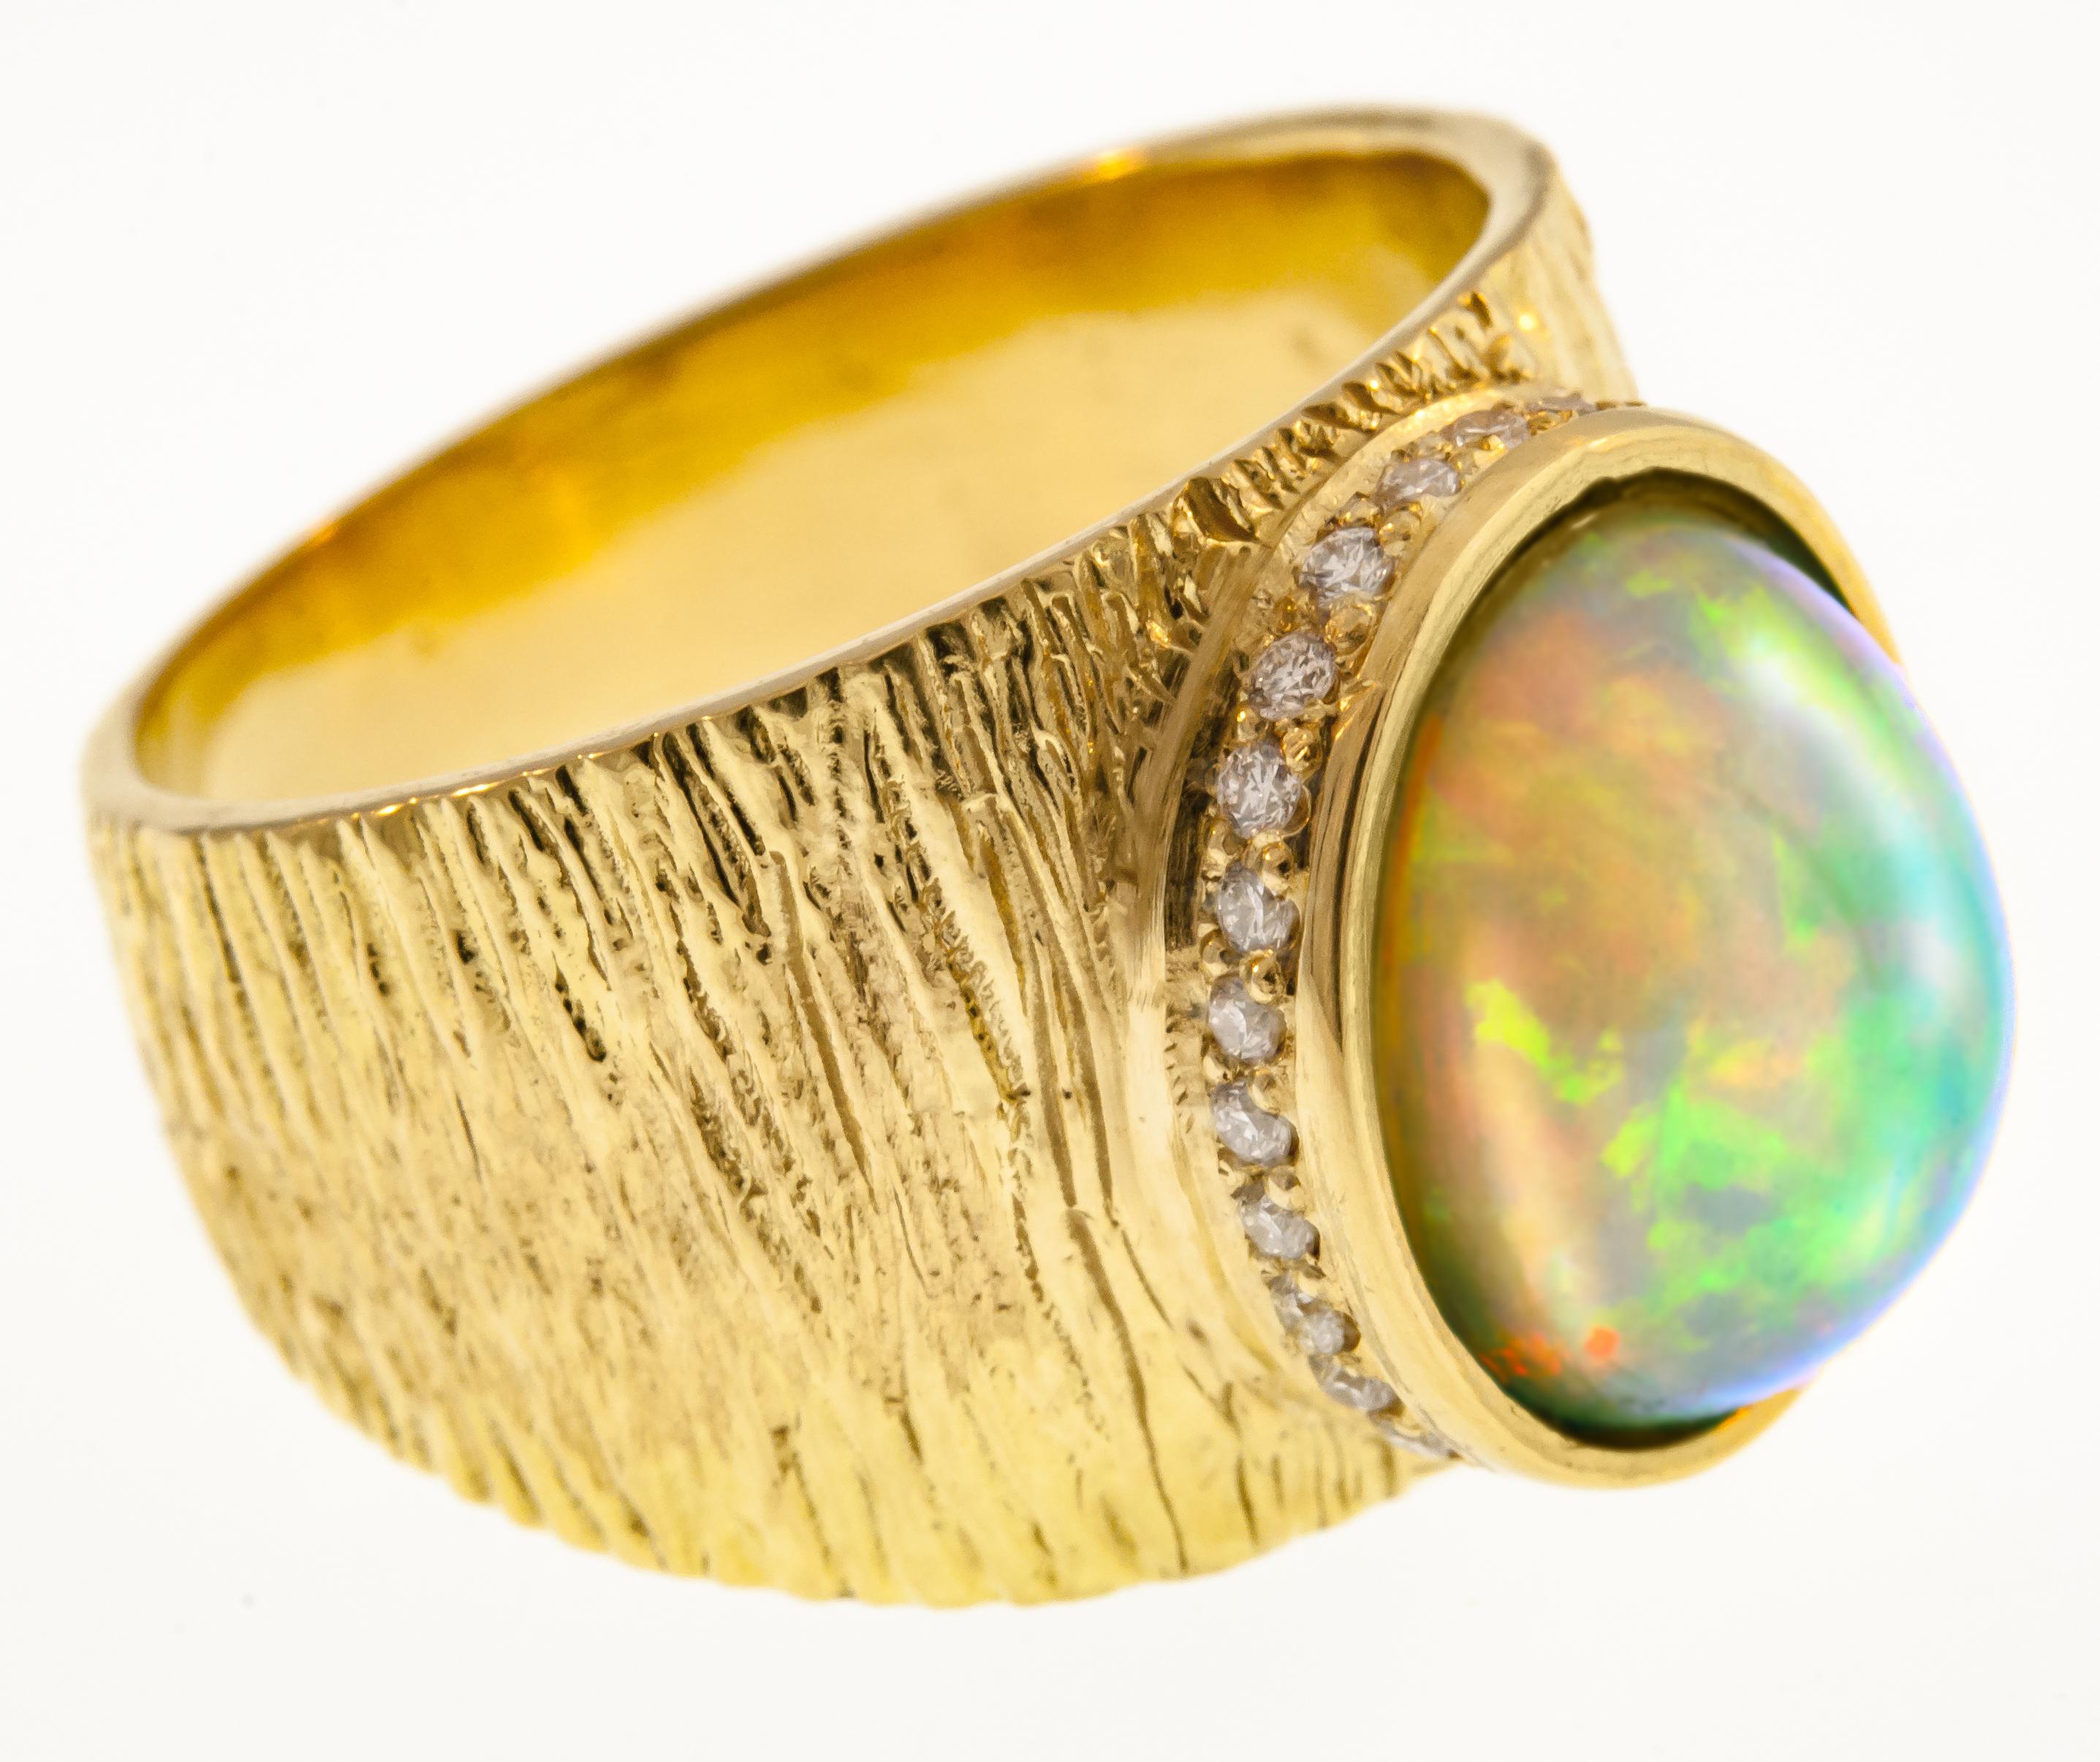 Kaali Designs opal Maya ring | JCK On Your Market